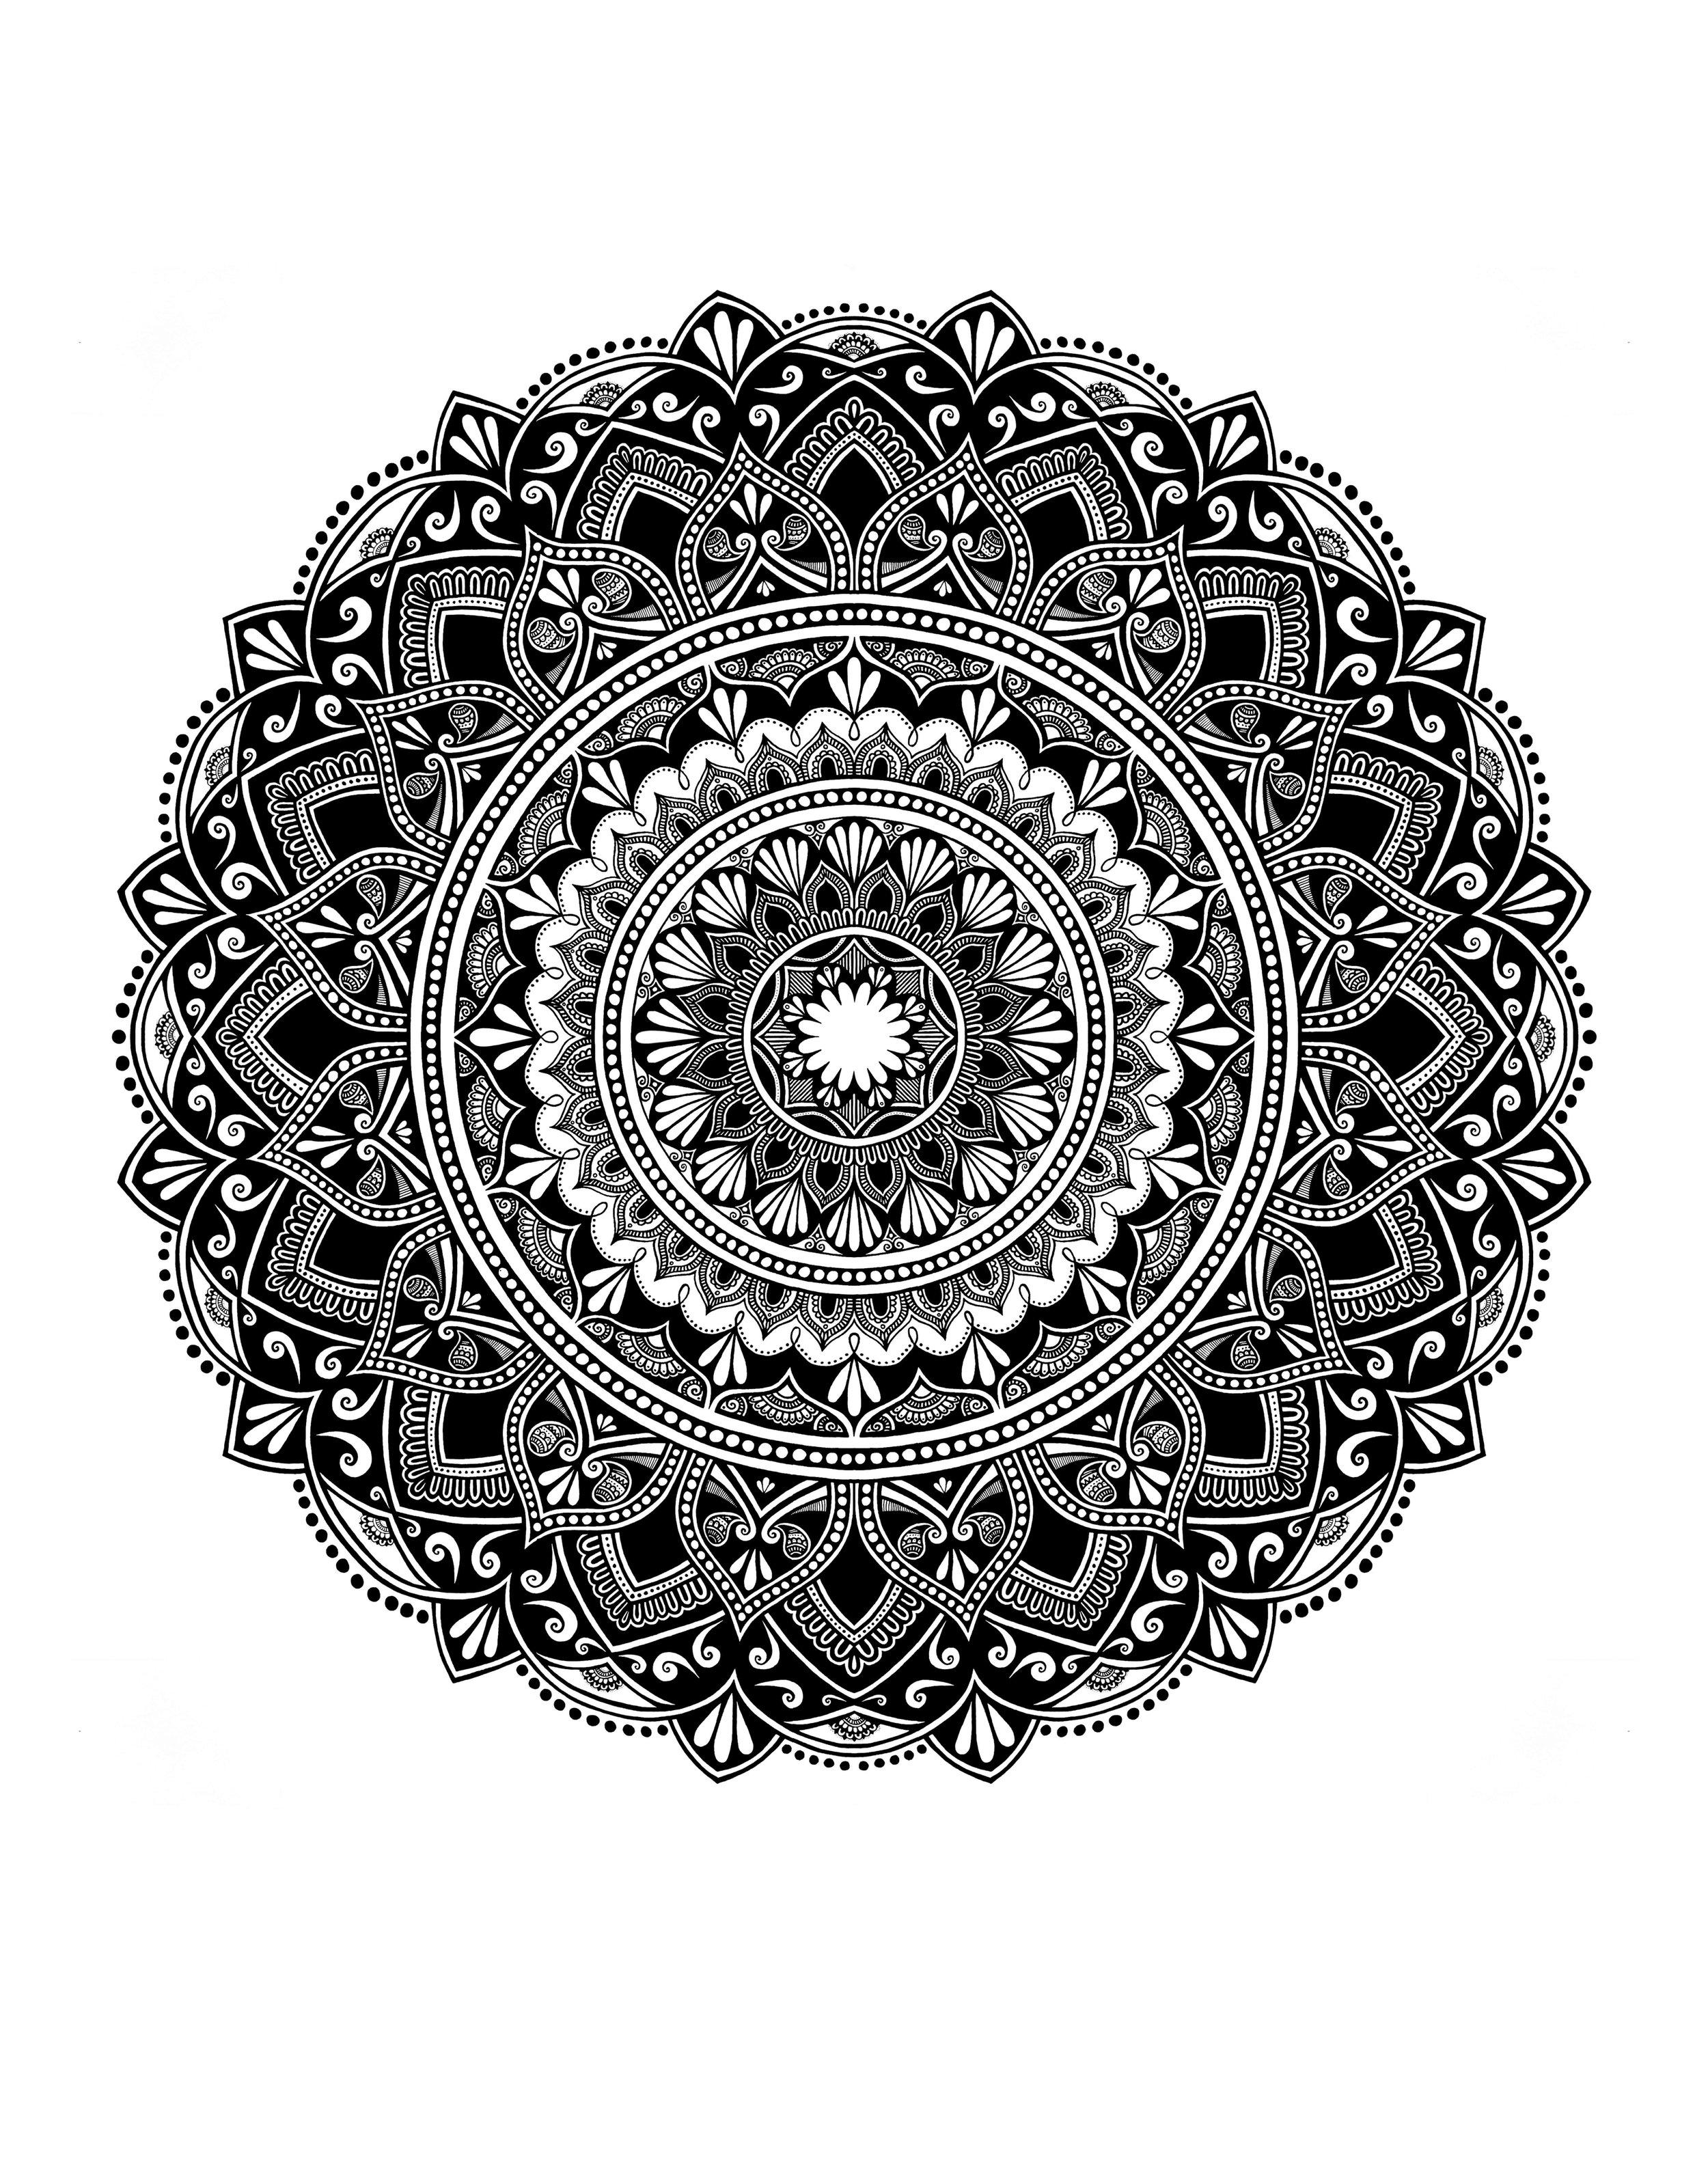 11x14 - Samatva Mandala - fortyonehundred copy.jpg